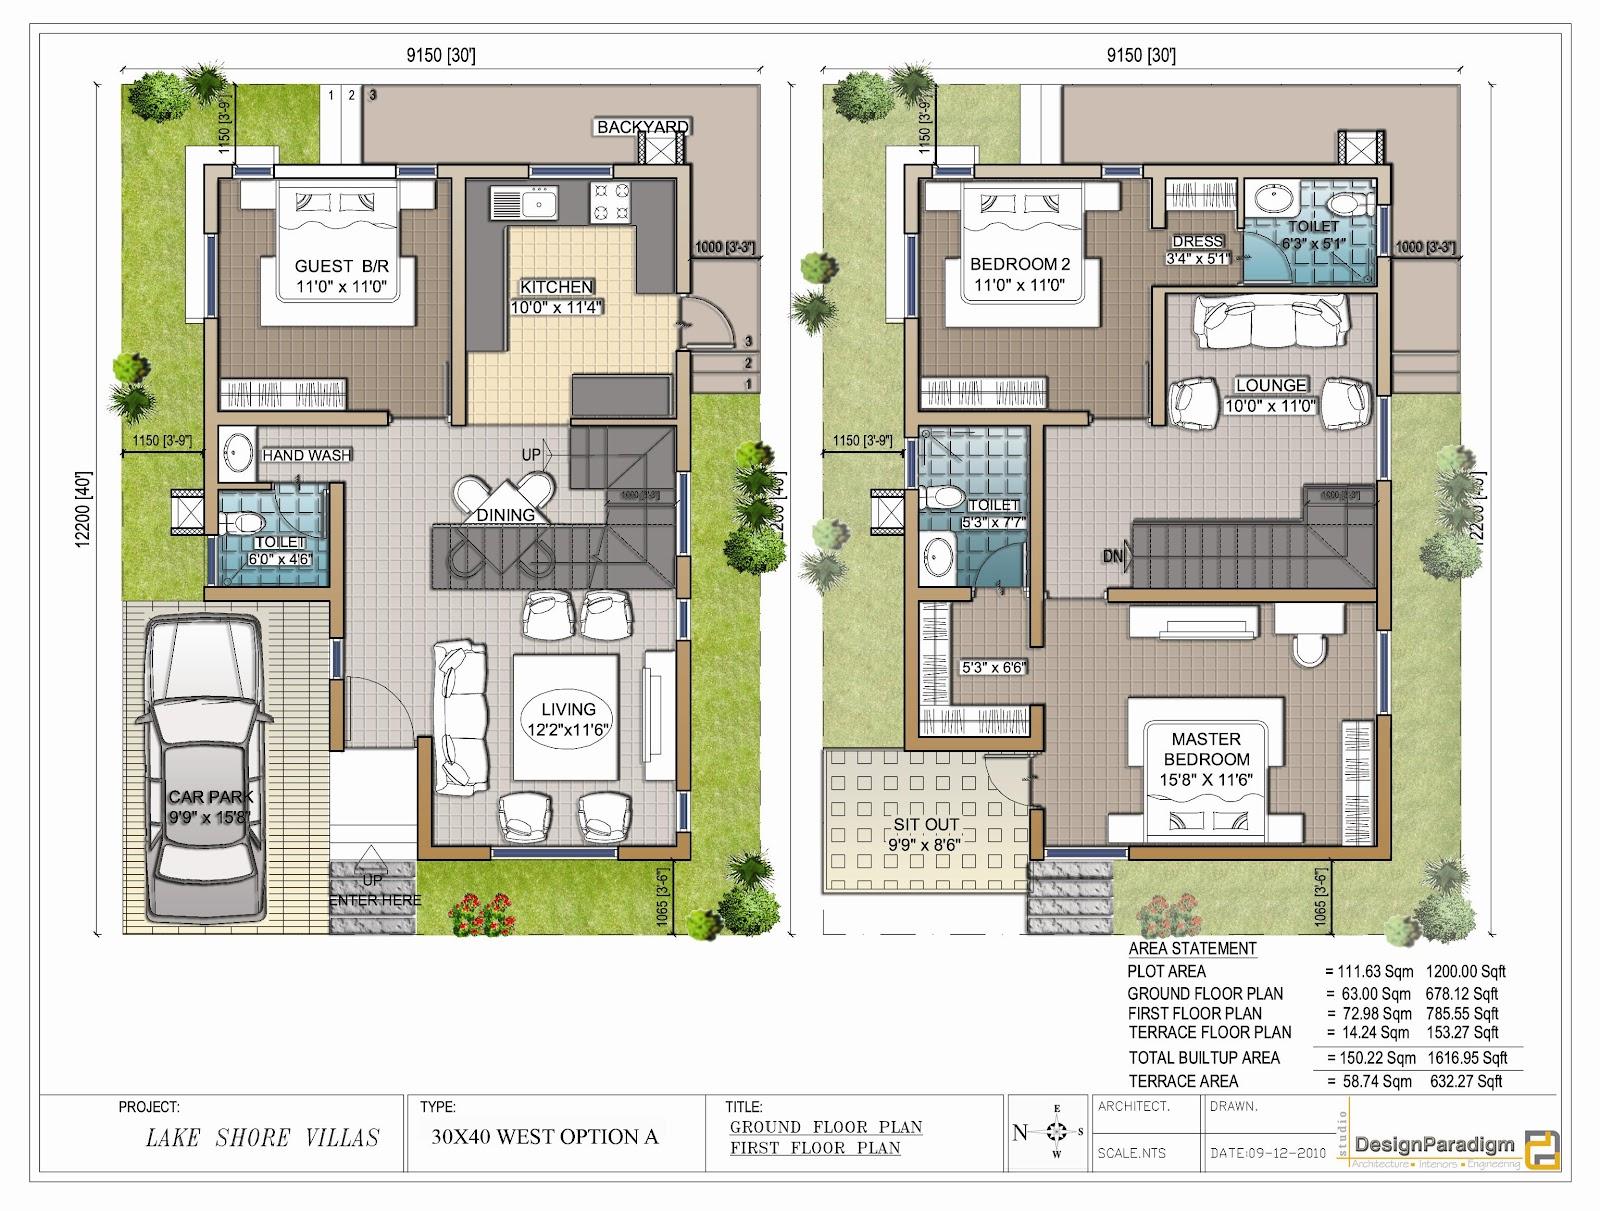 lake shore villas designer duplex villas for sale in